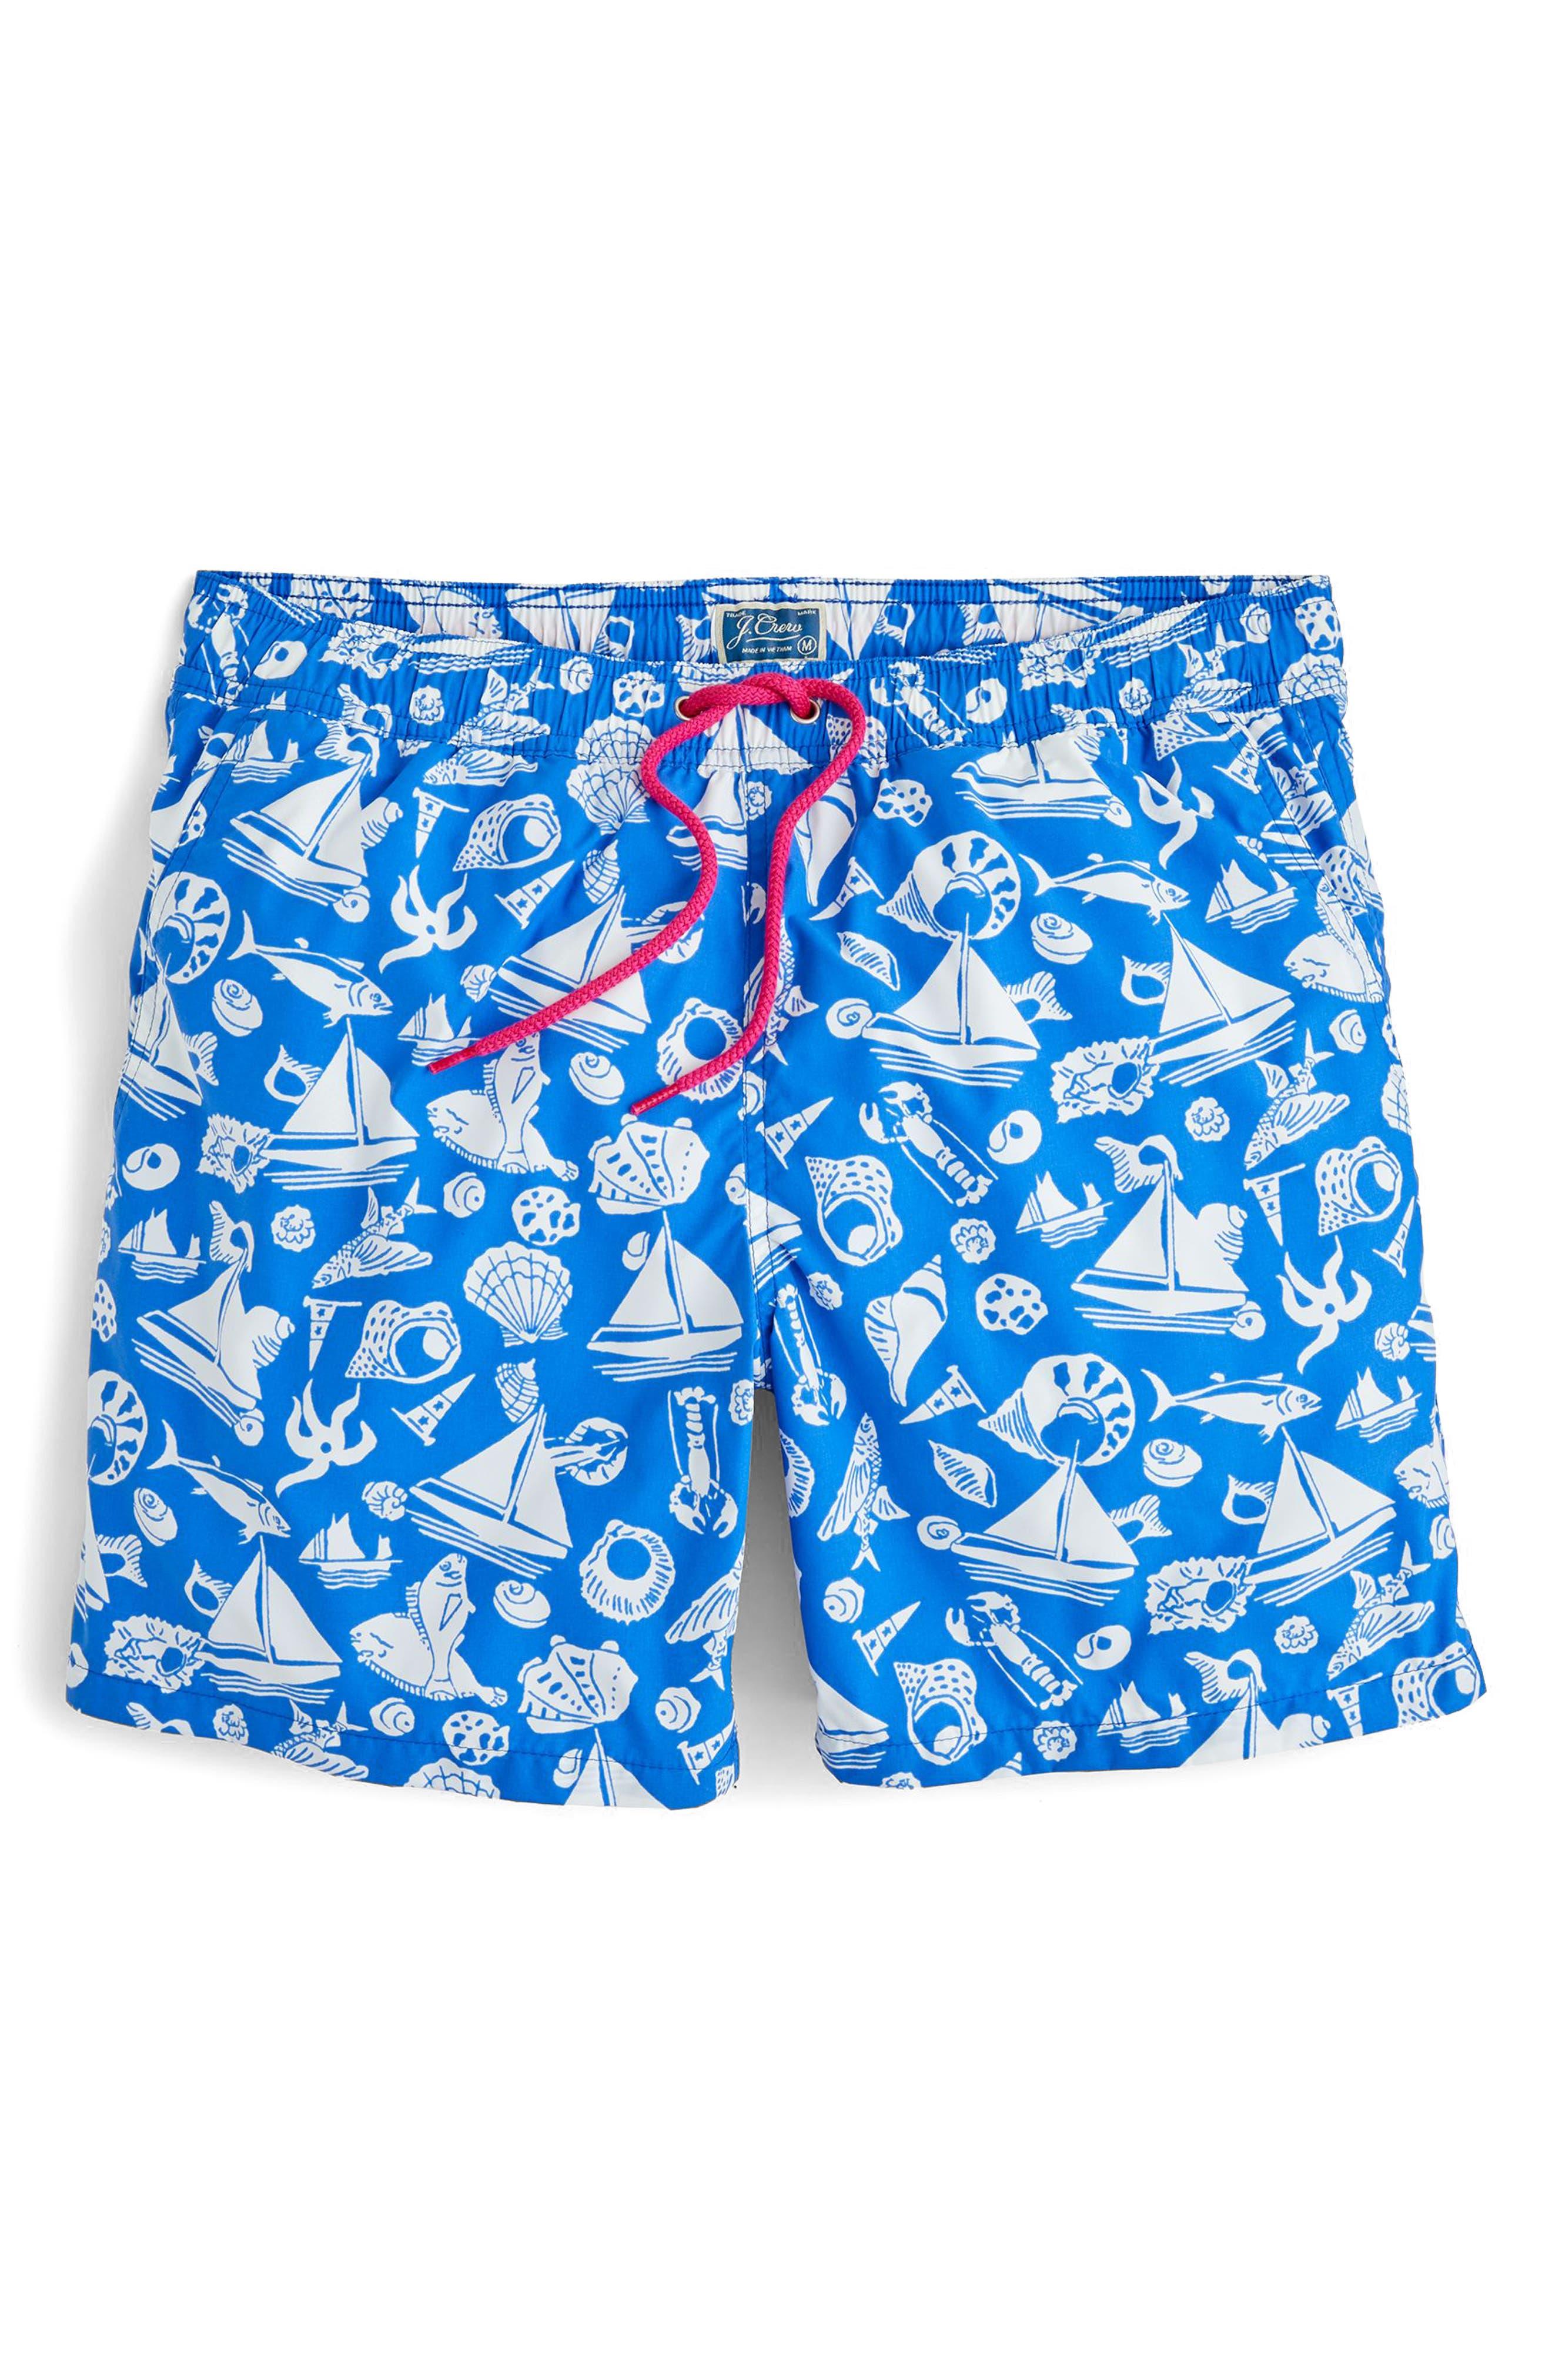 Seaside Print Swim Trunks,                         Main,                         color, 400